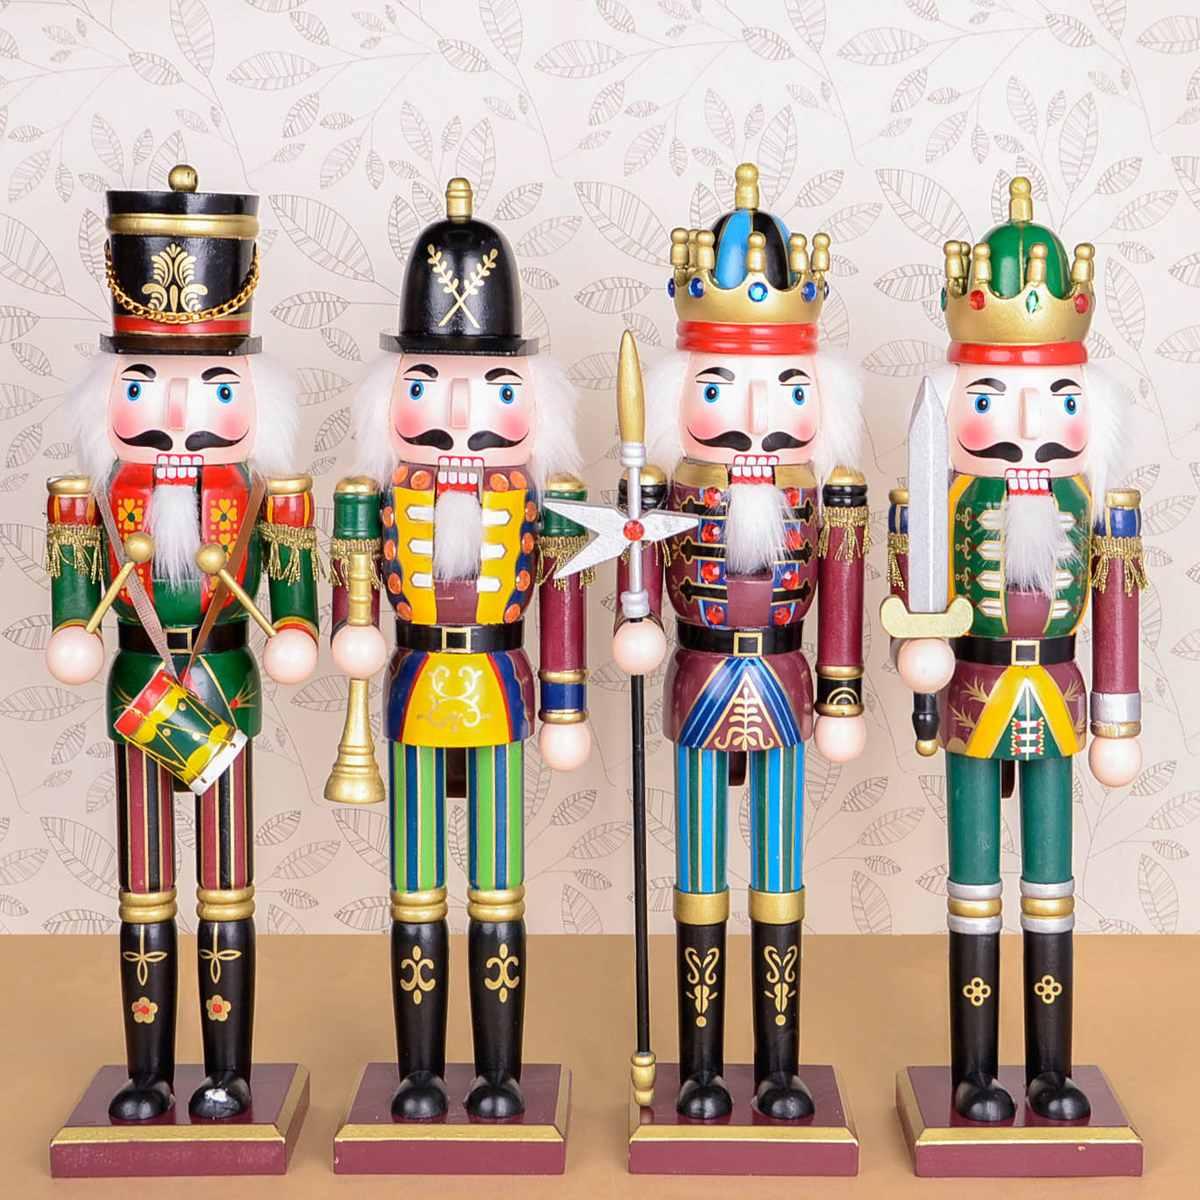 Wooden Nutcracker Doll Soldier Figures Vintage Handcraft Puppet Kids Toy Christmas Gift Decorative Ornaments Home Decoration Солдат